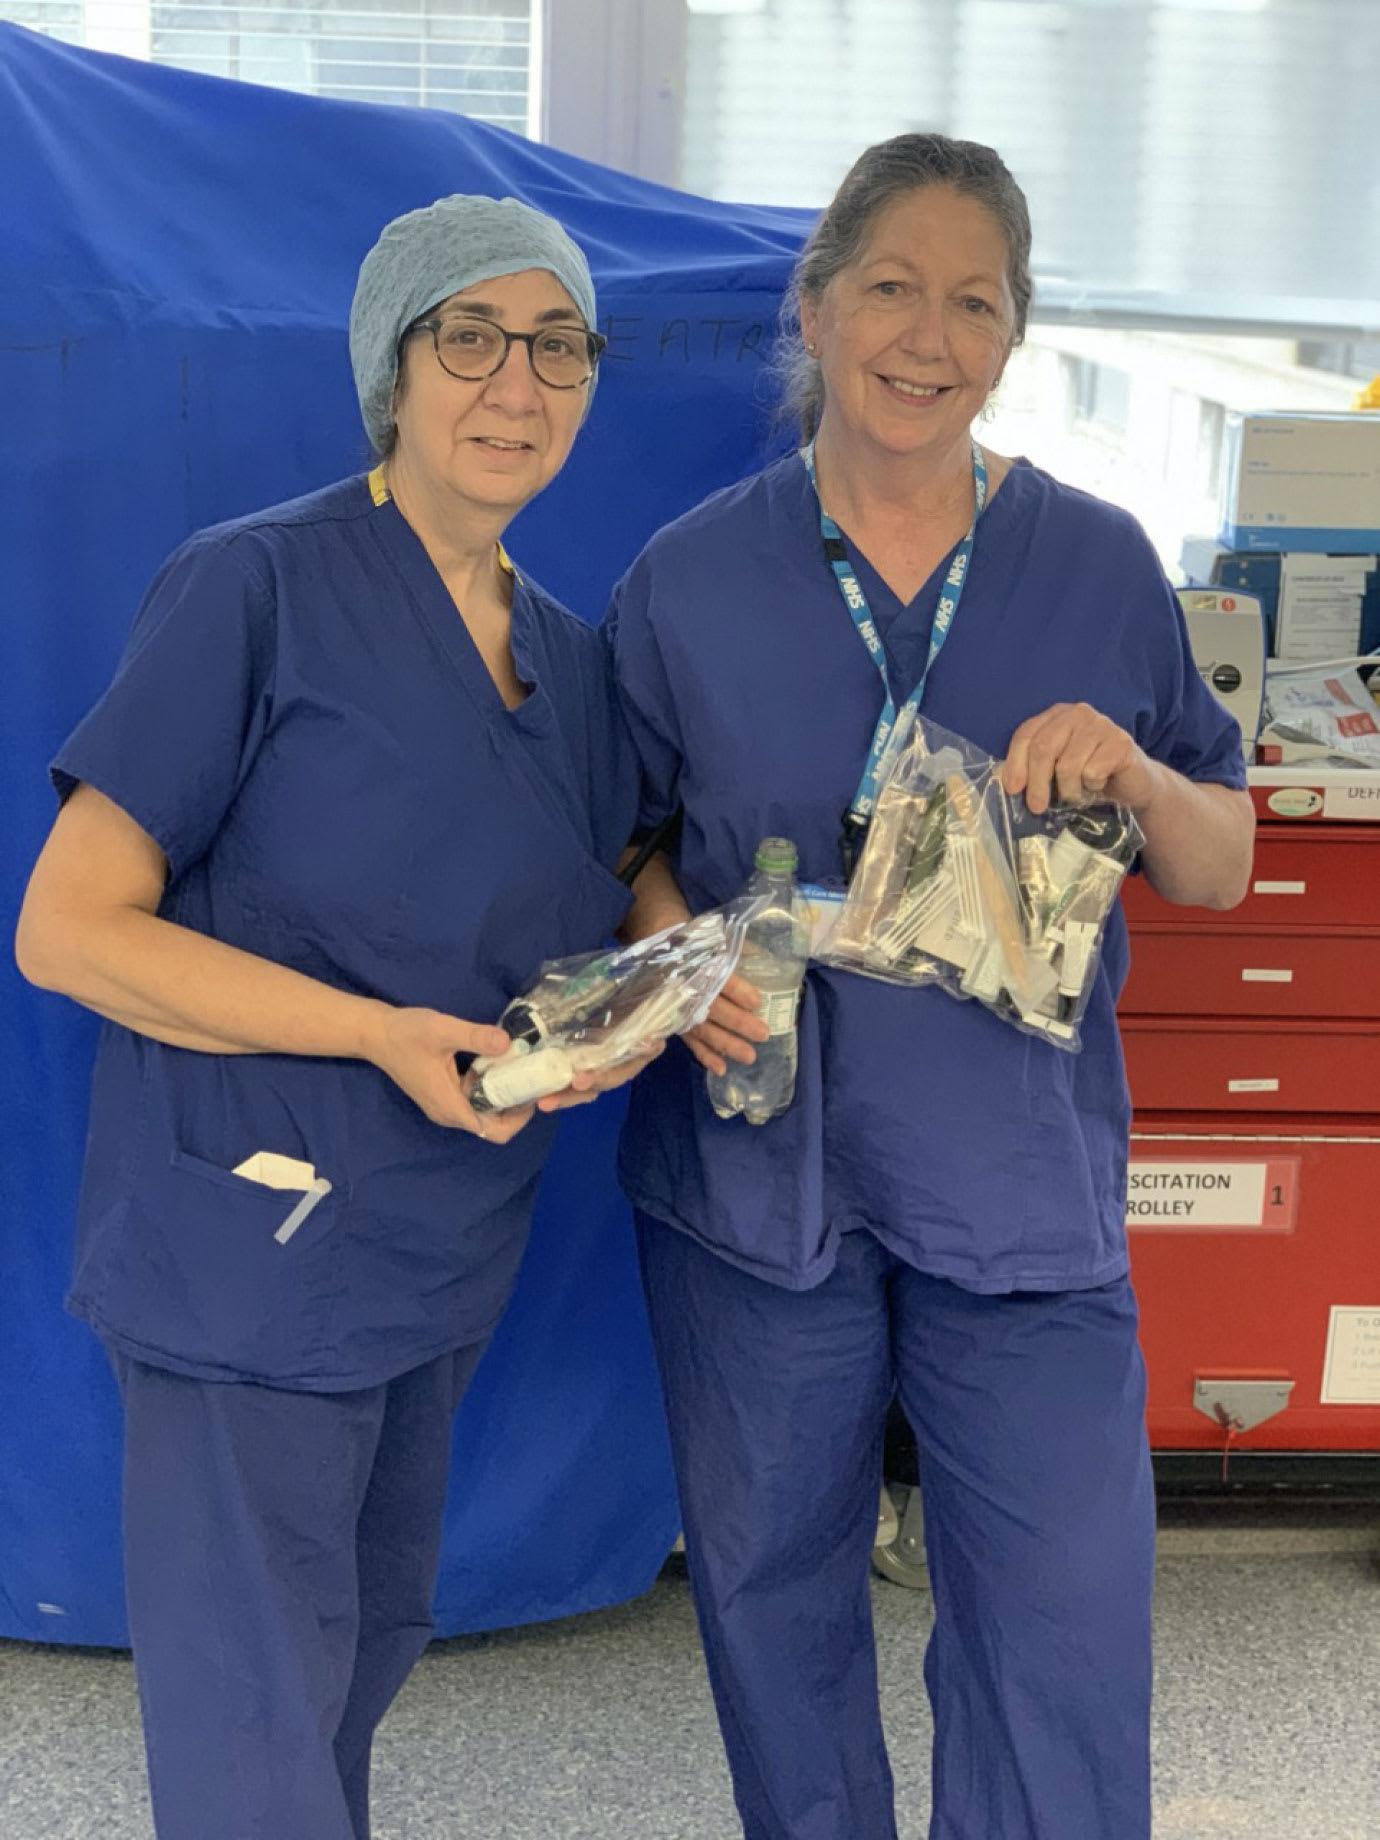 Two nurses in blue uniforms.